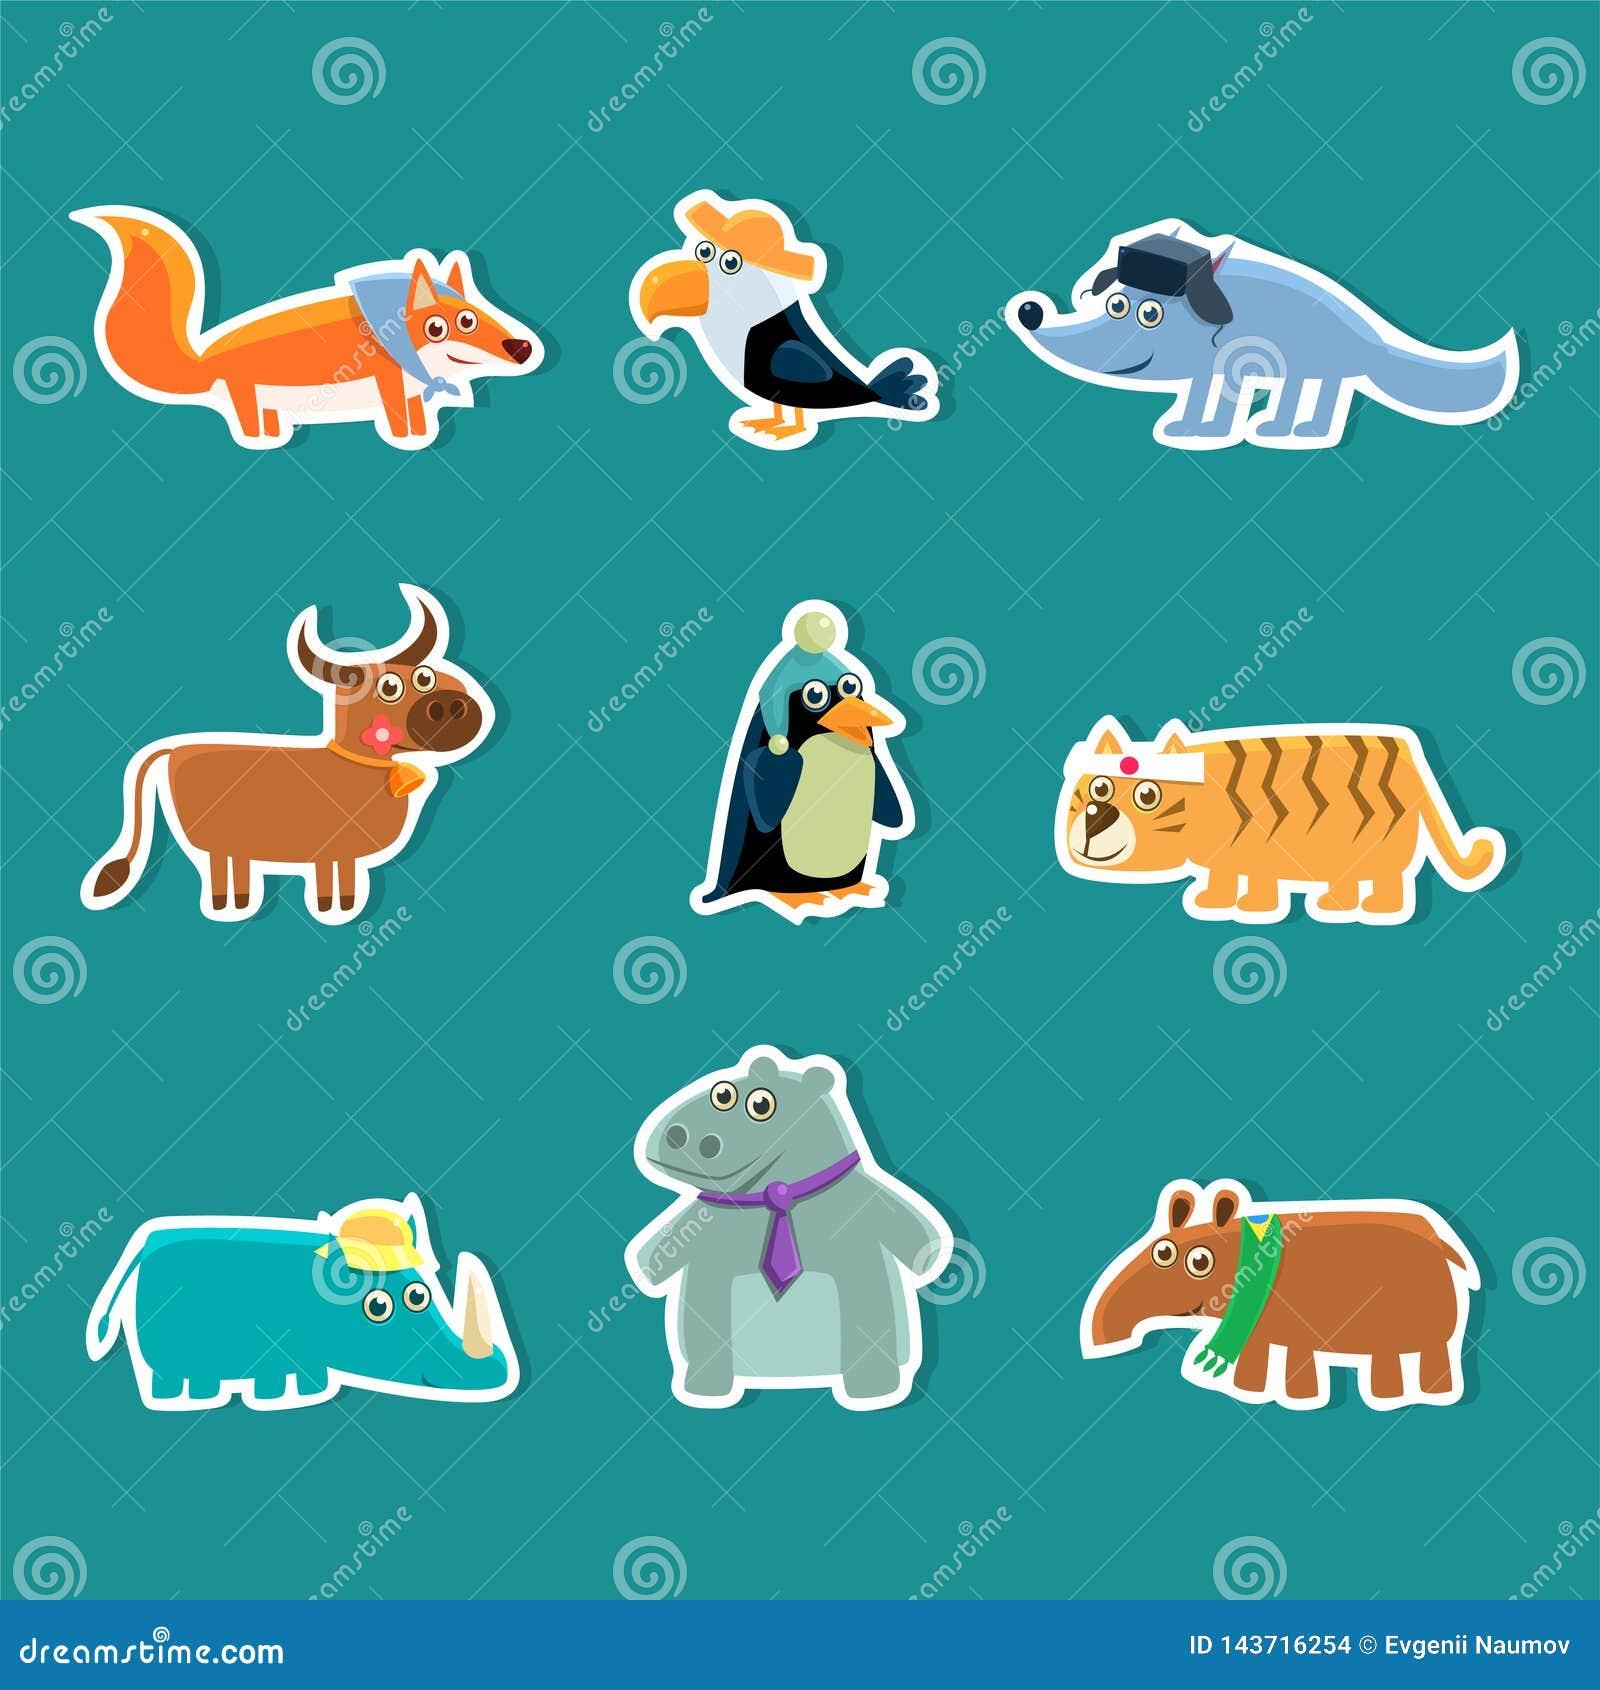 Collection of Cute Cartoon Animal Stickers, Fox, Toucan, Wolf, Cow, Penguin, Tiger, Rhino, Hippopotamus, Aardvark Vector